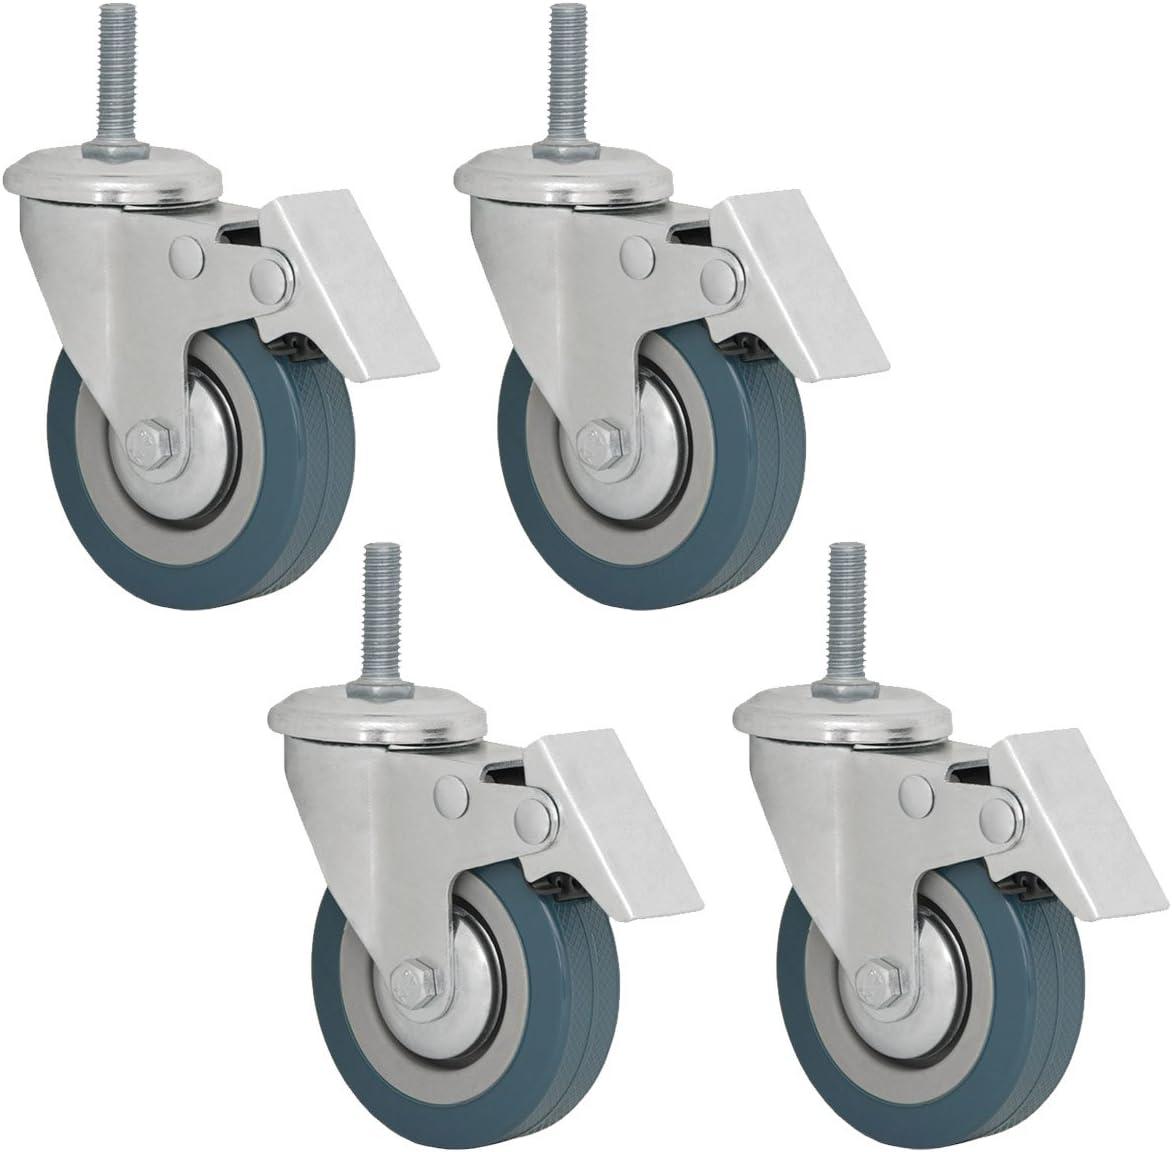 4 Ruedas 75mm pivotantes para muebles con Freno de eyepower | Montaje con tornillo de sujeción rosca M10 | Ruedecilla de nailon giratoria 360° y con bloqueo | color Plateado